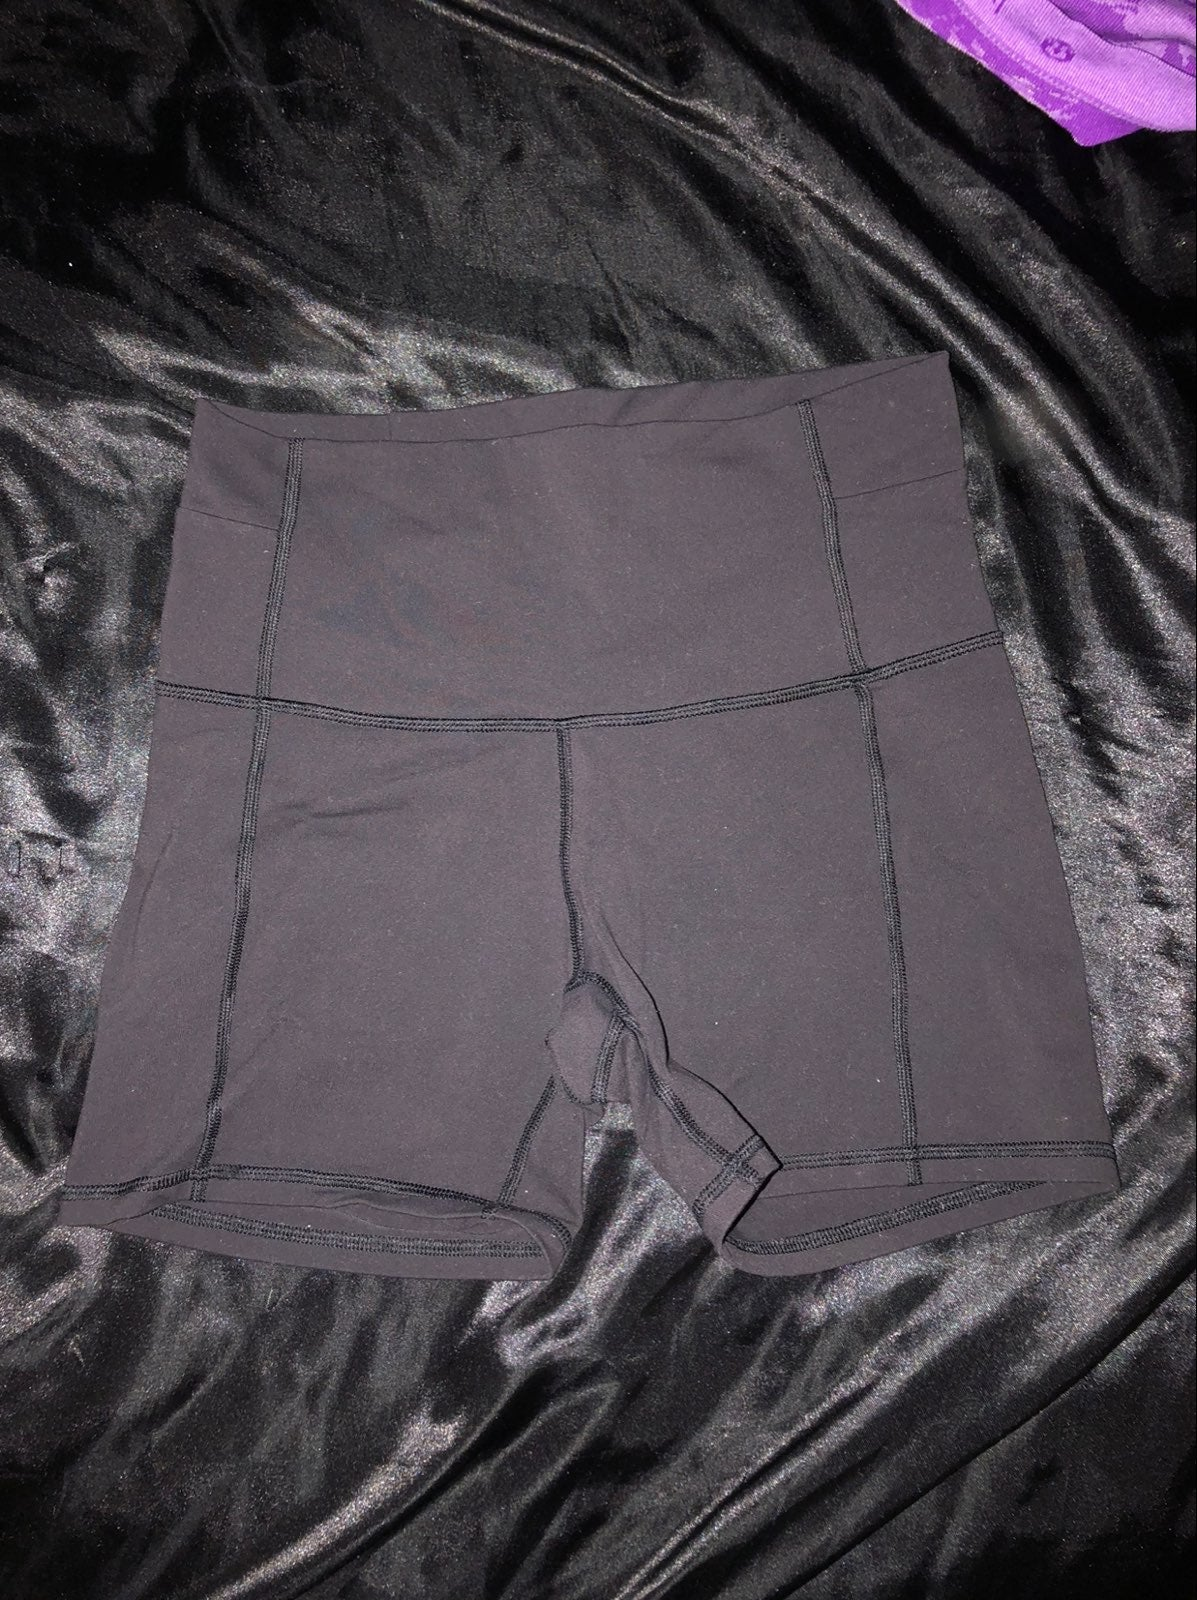 Lululemon Athletica Align Shorts in Blac